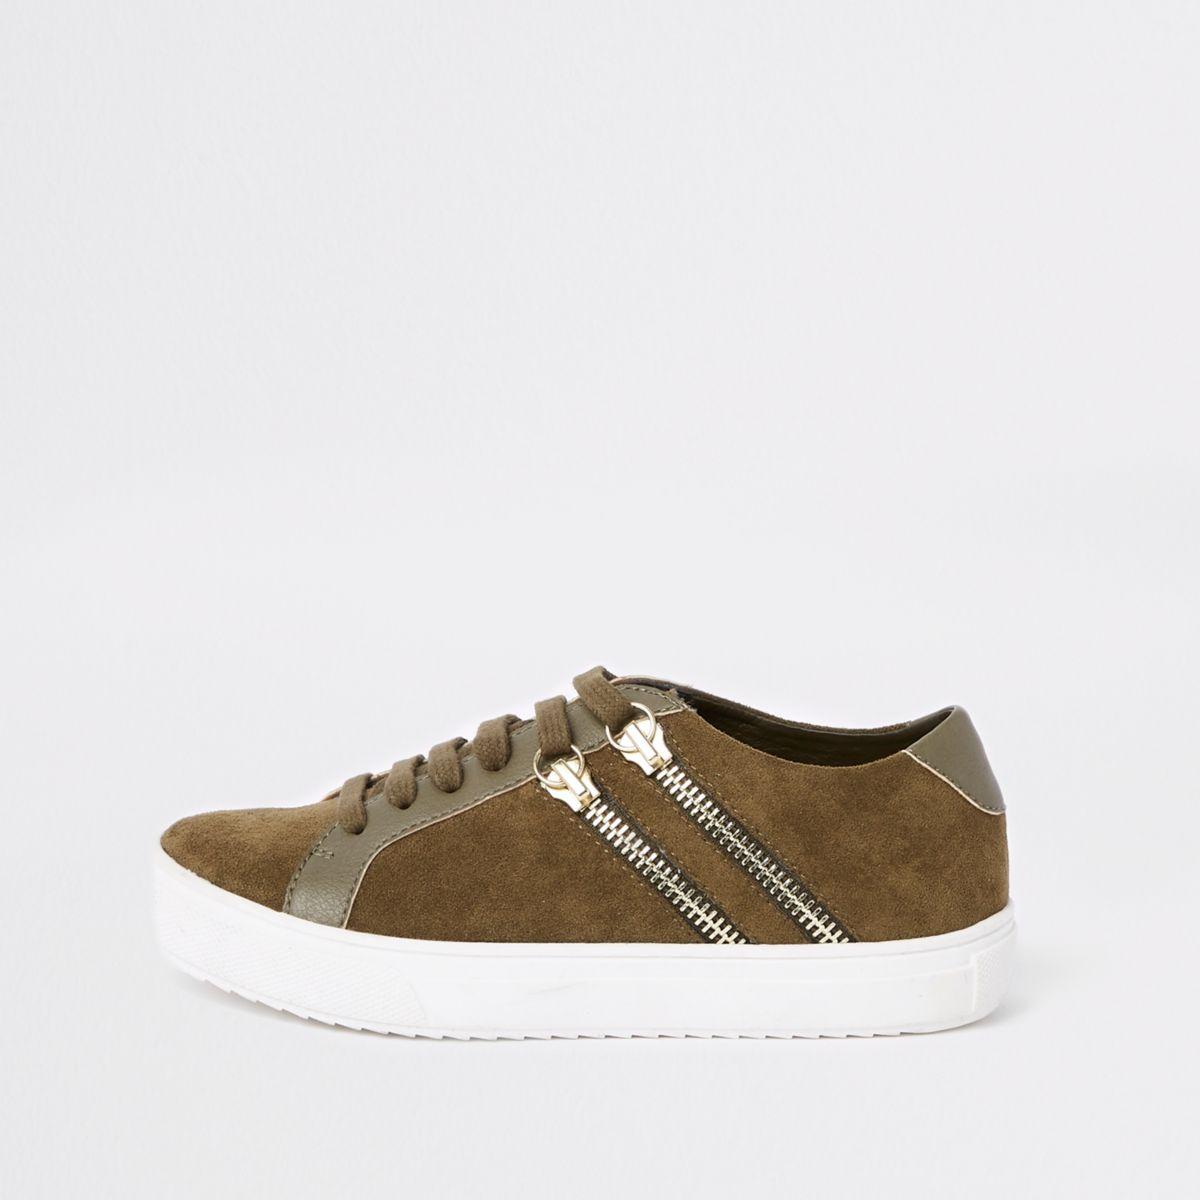 Boys khaki lace-up double zip sneakers